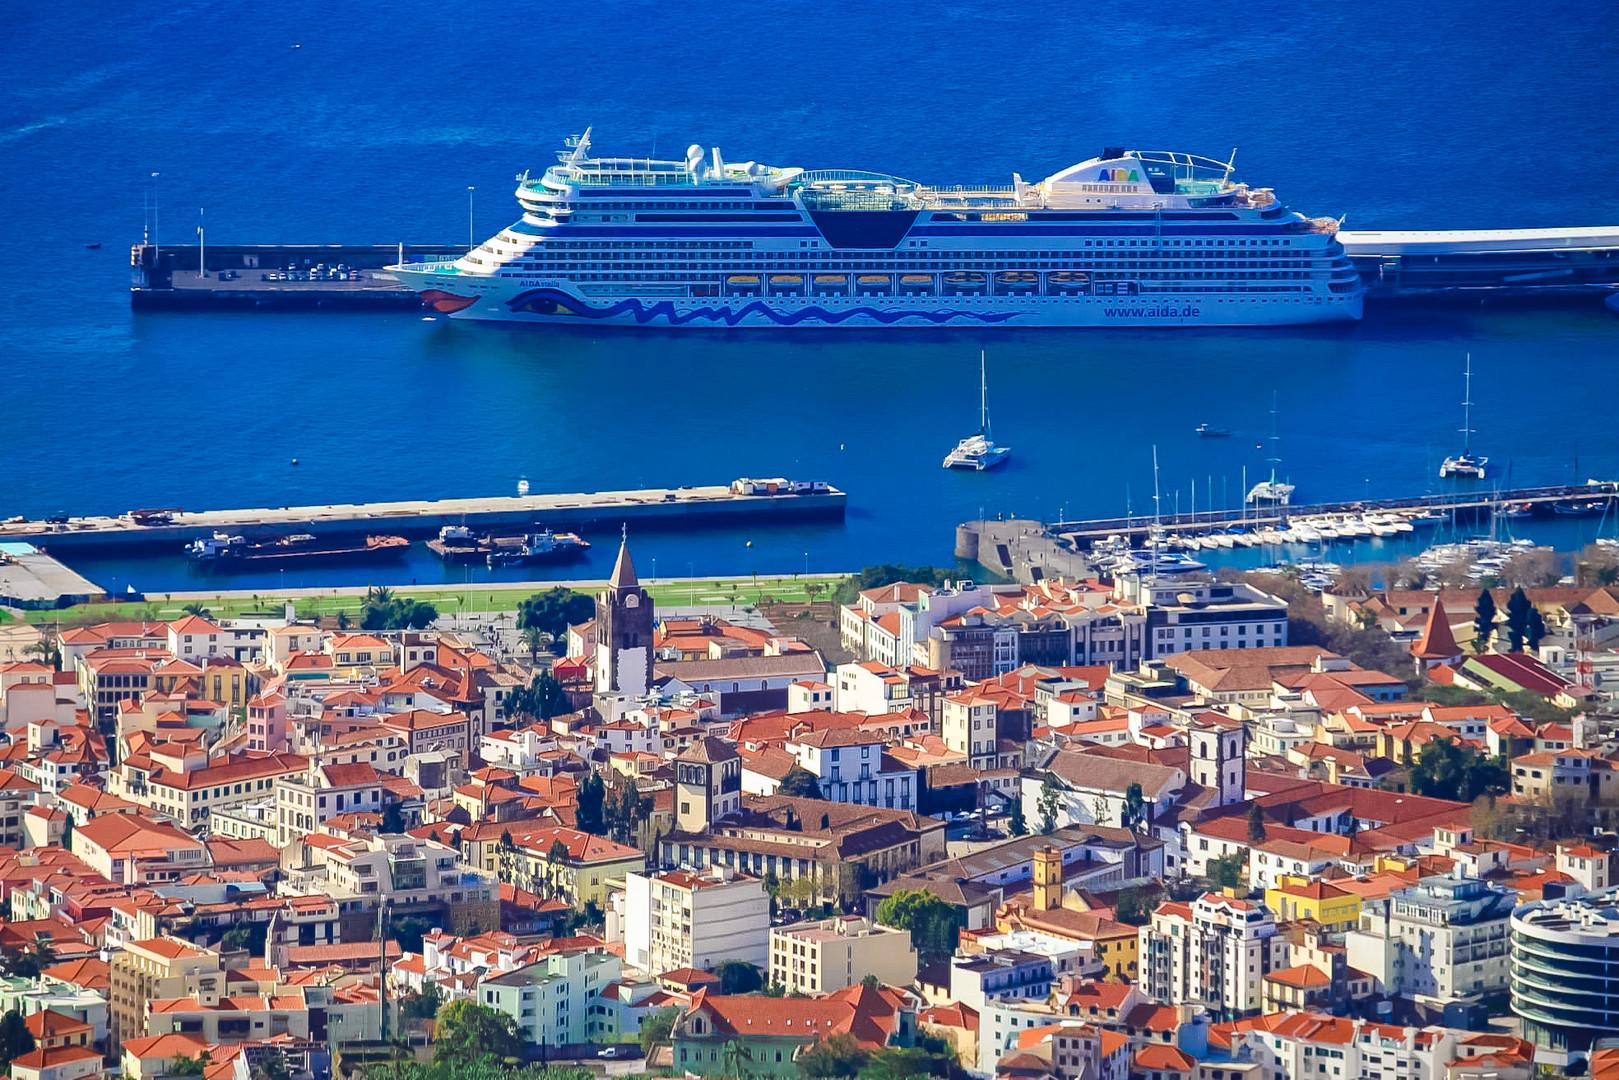 Porto Of Funchal - Madeira Island